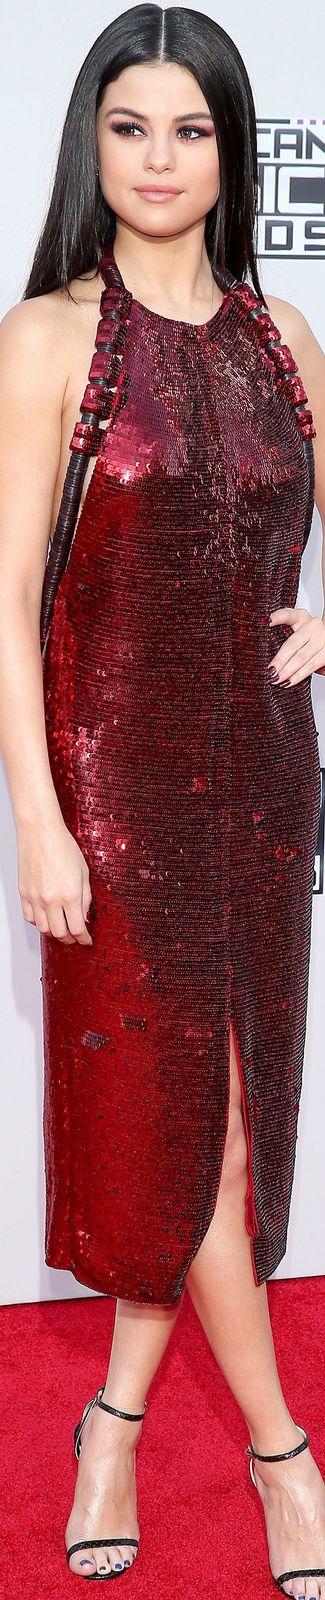 Selena Gomez in Givenchy 2015 American Music Awards p/b LOLO ~ via Marguerite Burrill